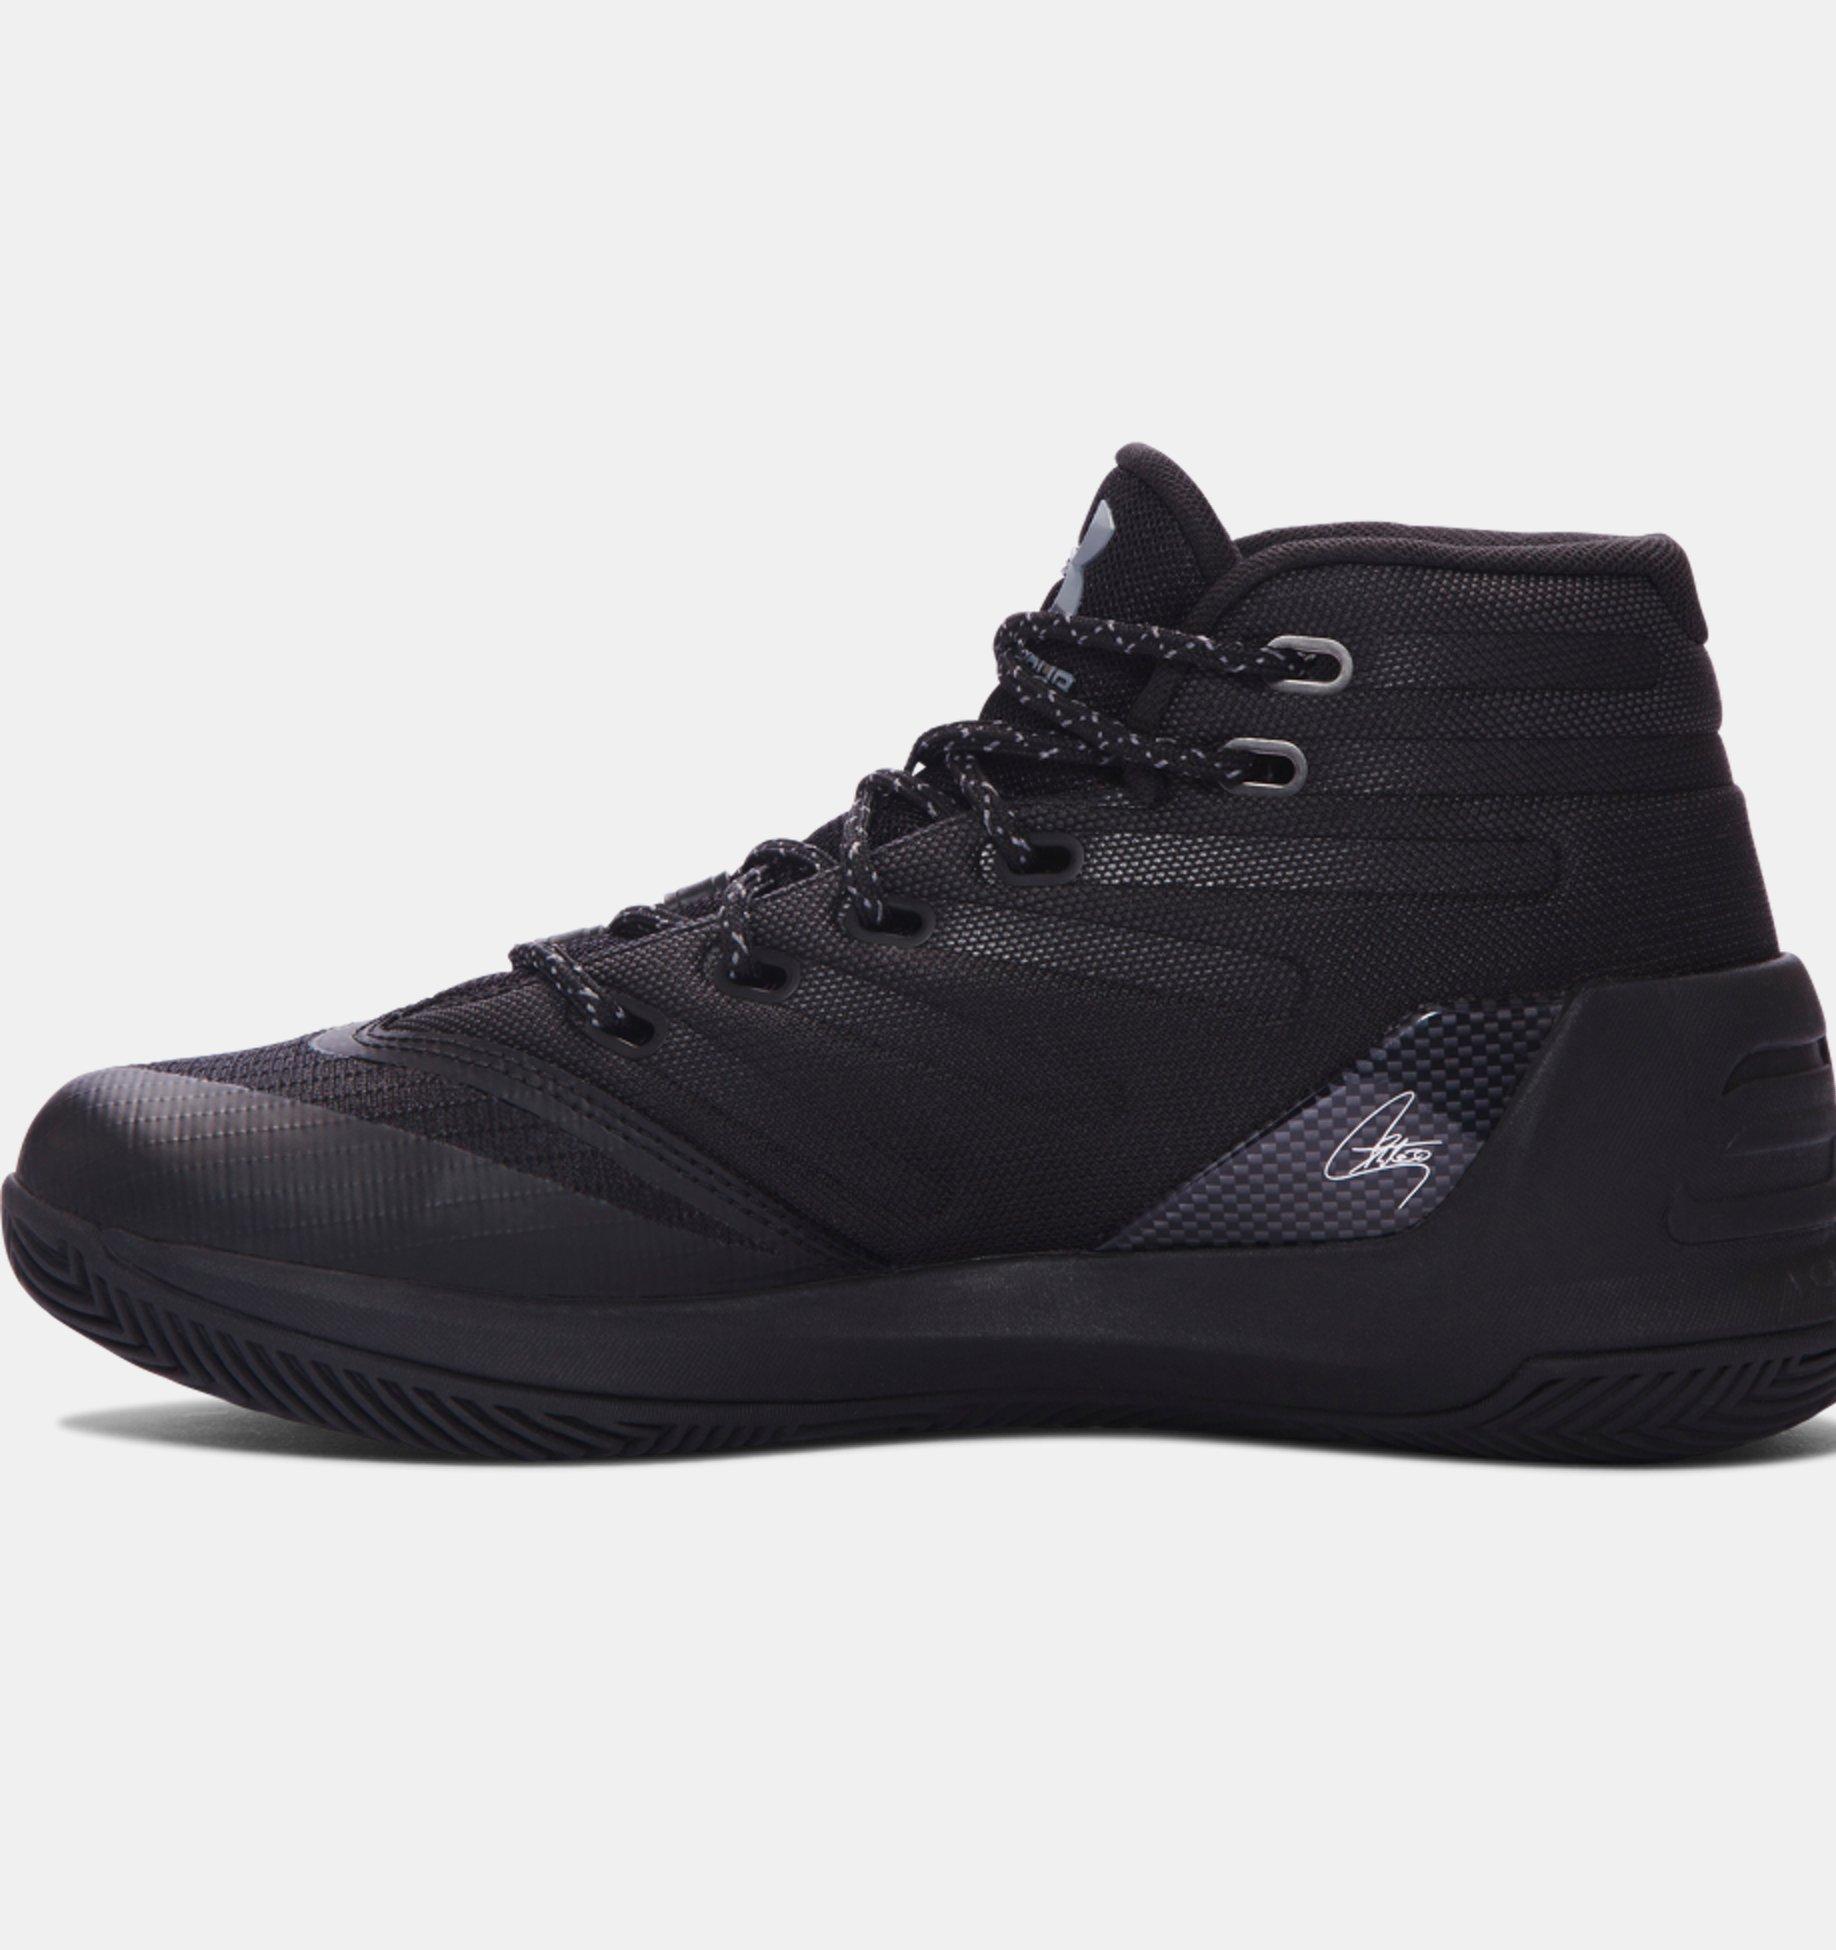 70b93a74b069 ... Boys  Grade School UA Curry 3 Basketball Shoes ...